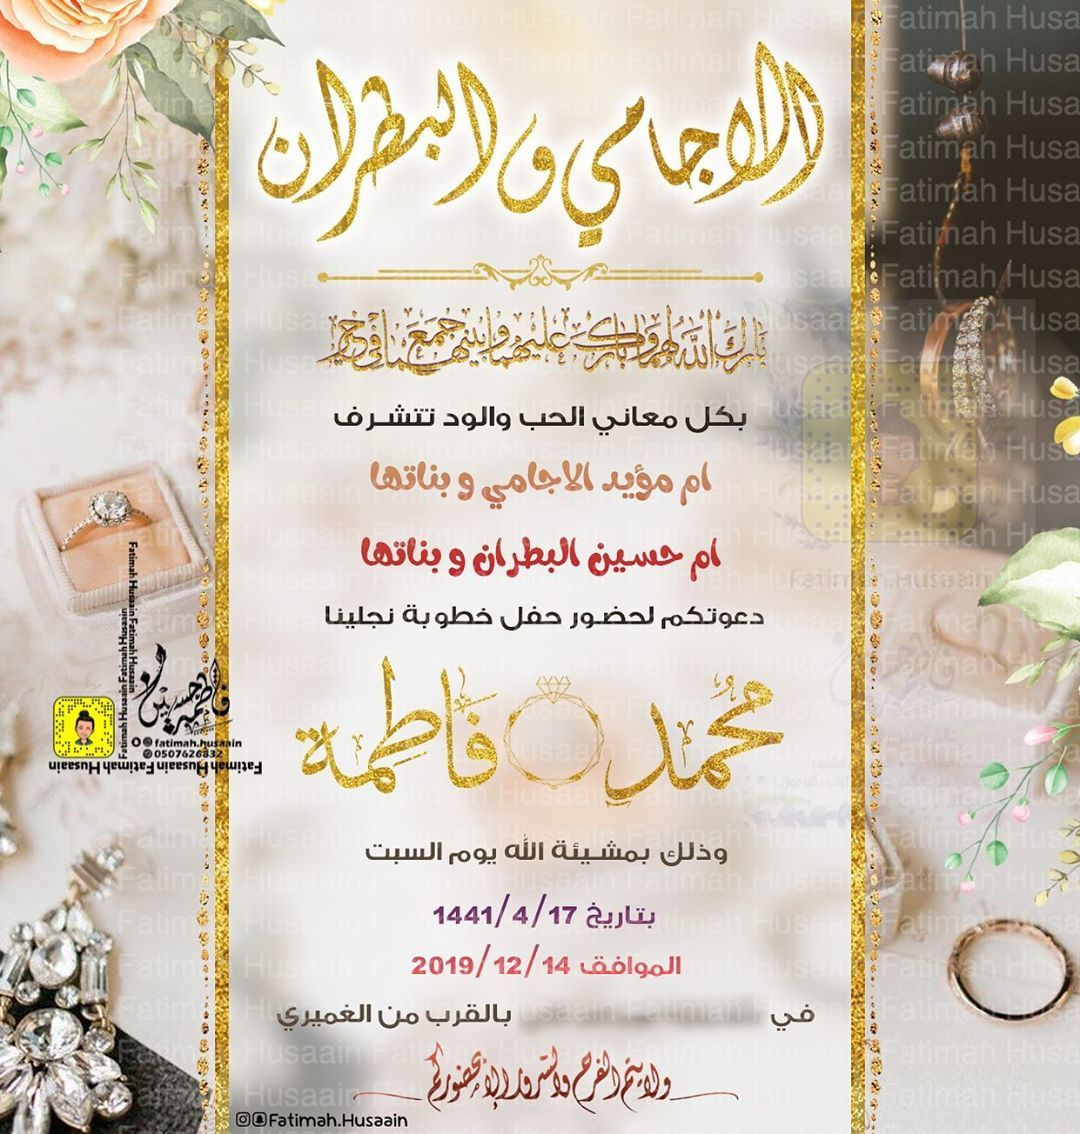 Fatimah Husaain للثيمات On Instagram بطاقة زواج كرت زواج زفاف عروس عريس عرايس مناسبات Place Card Holders Place Cards Cards